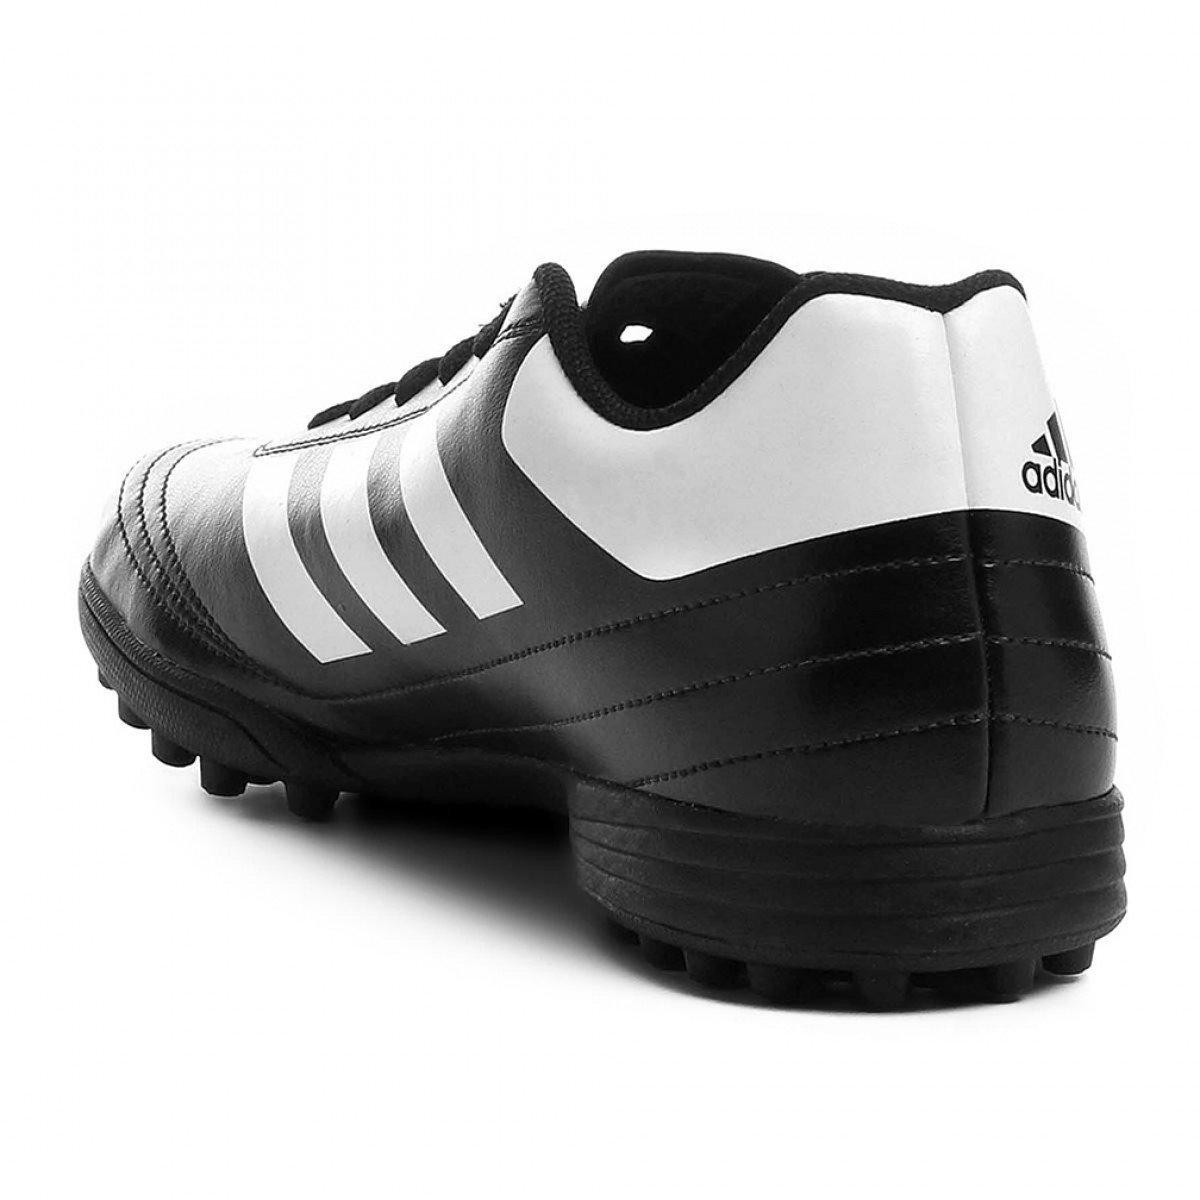 d7c74b494e ... Chuteira Society Adidas Goletto 6 TF Masculina - Preta e Branca ...